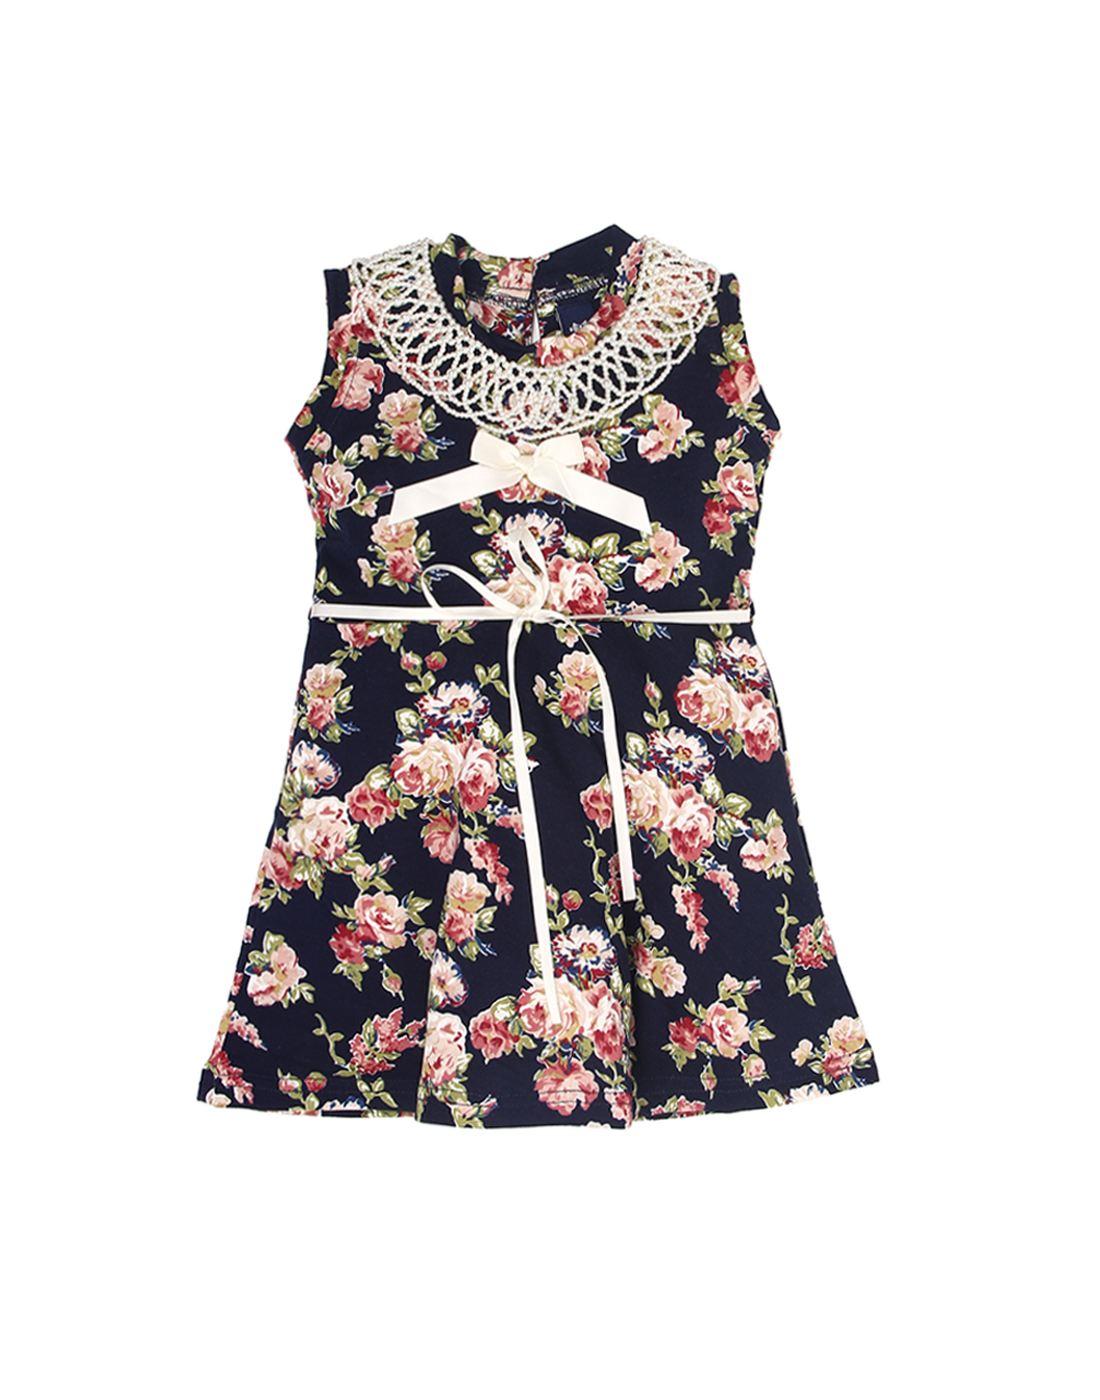 K.C.O 89 Girls Casual Printed Sleeveless Dress